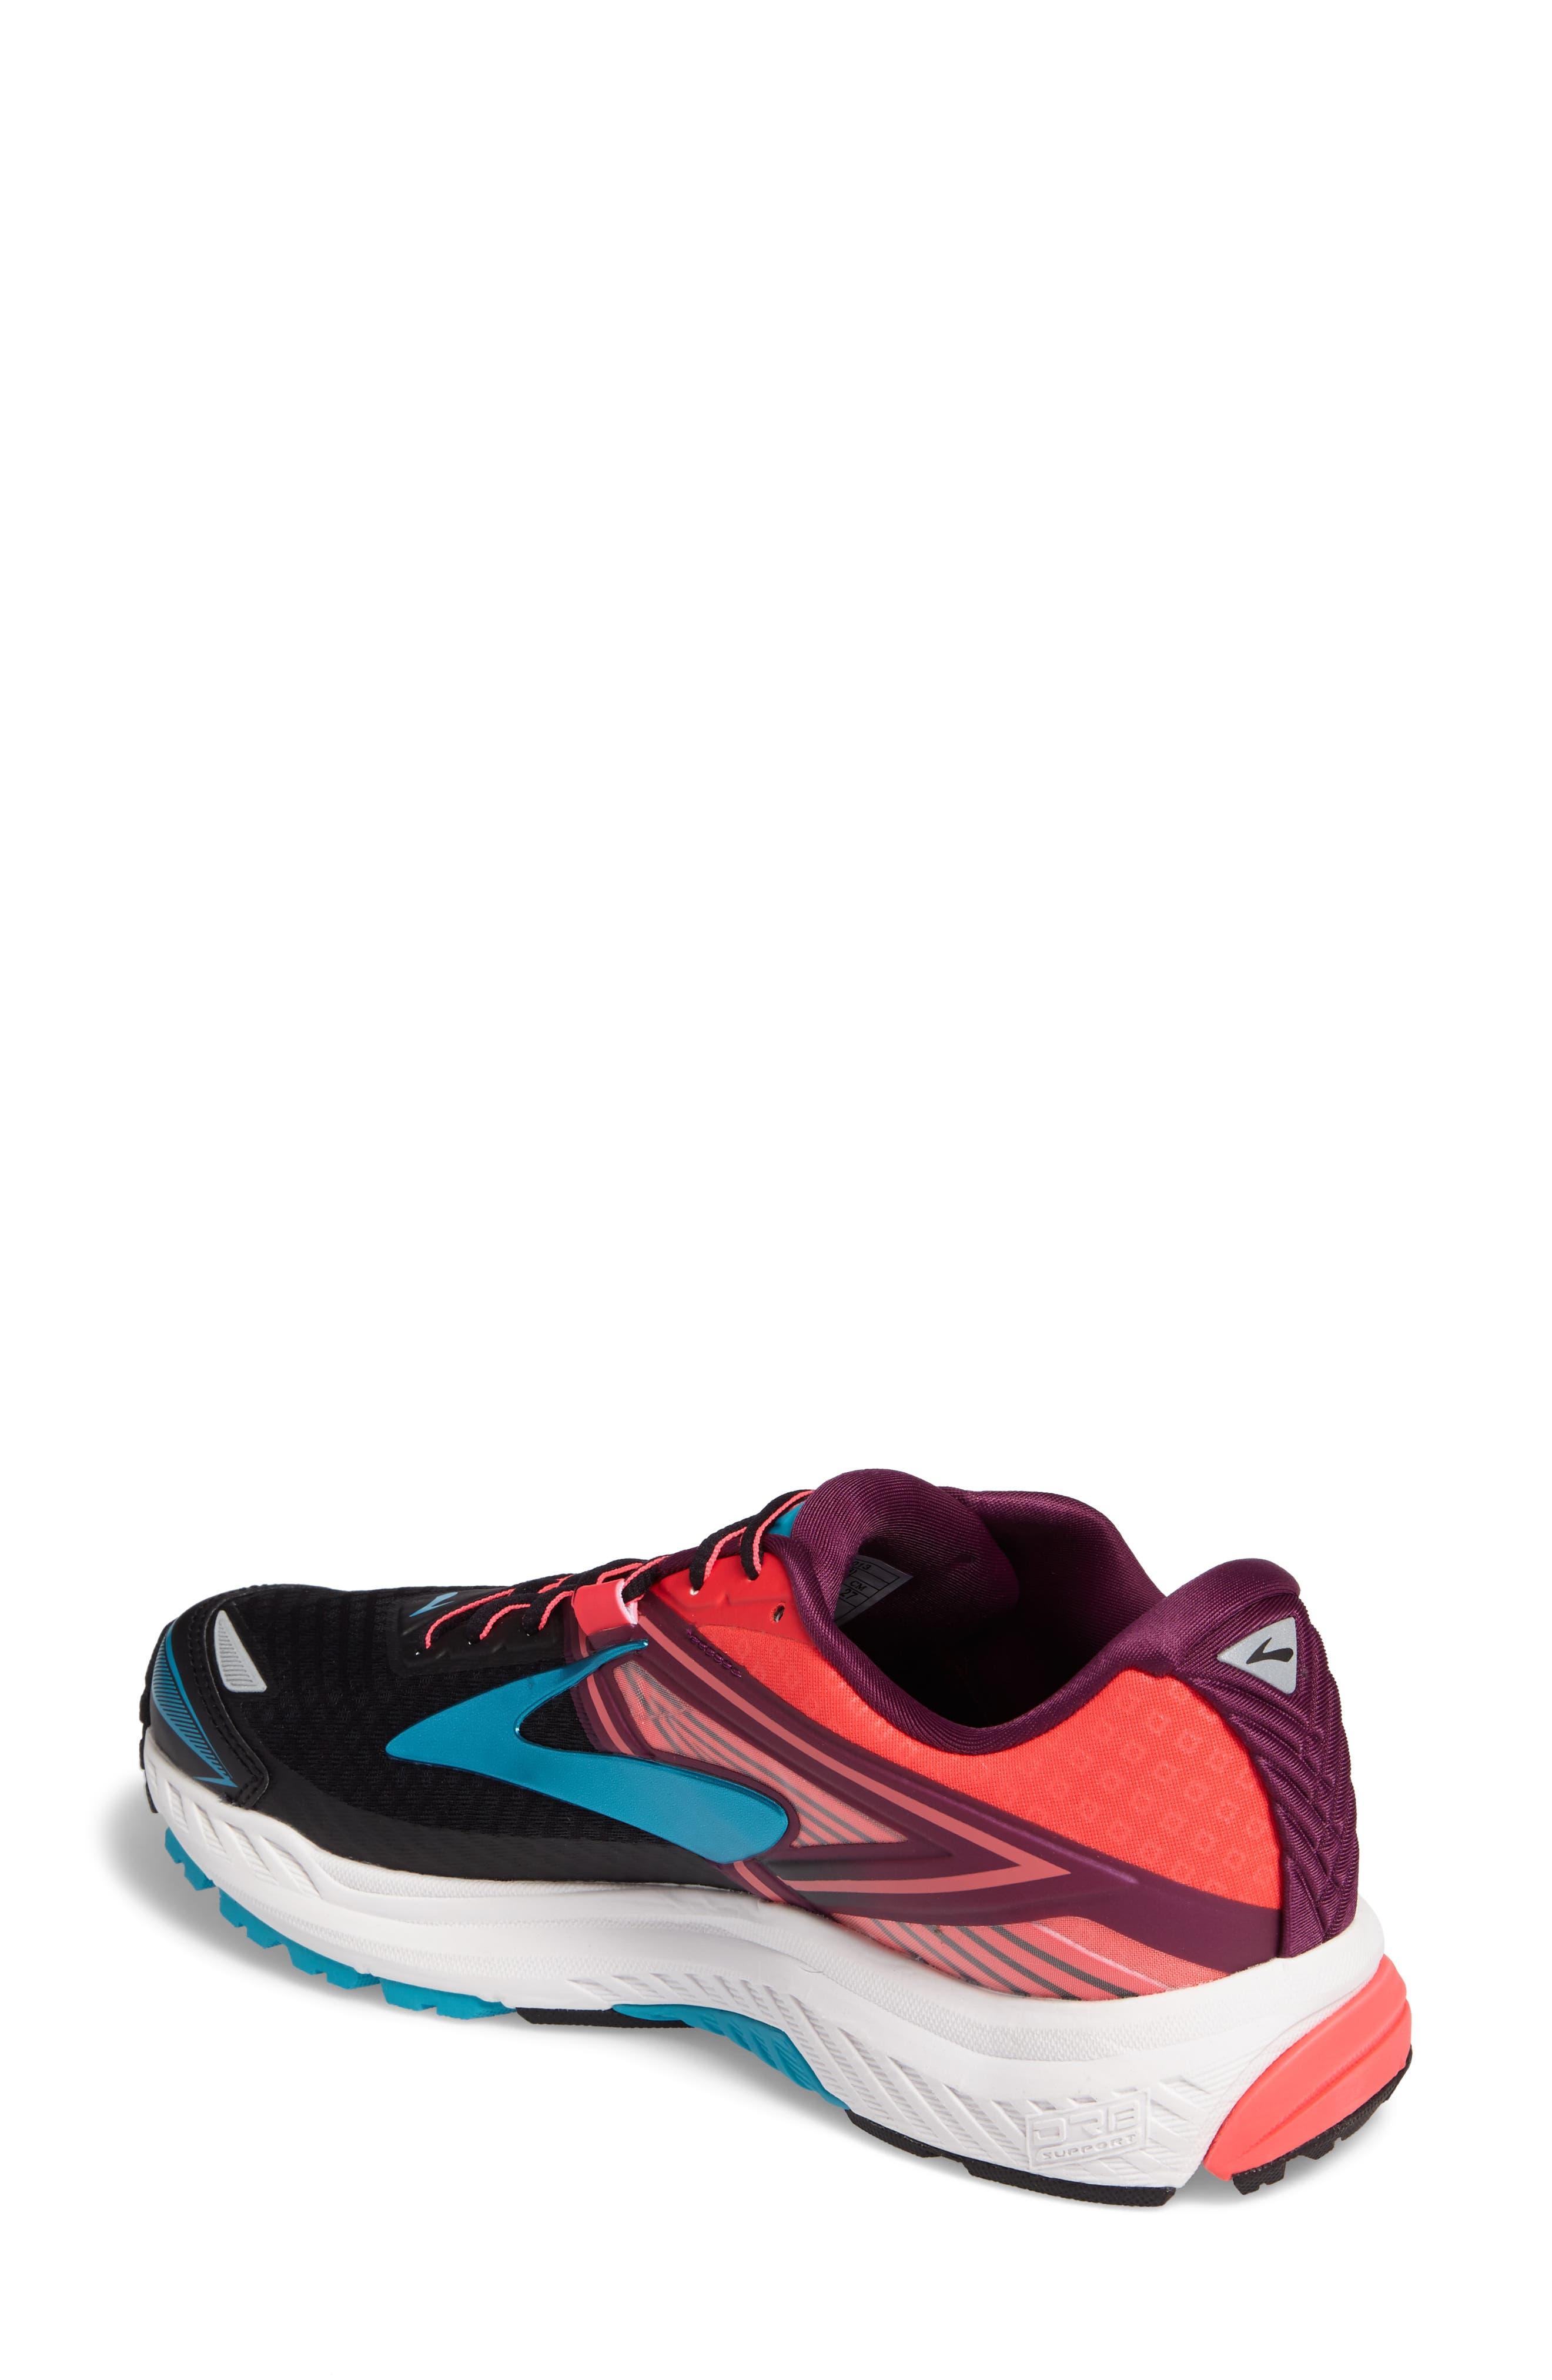 Ravenna 8 Running Shoe,                             Alternate thumbnail 2, color,                             013